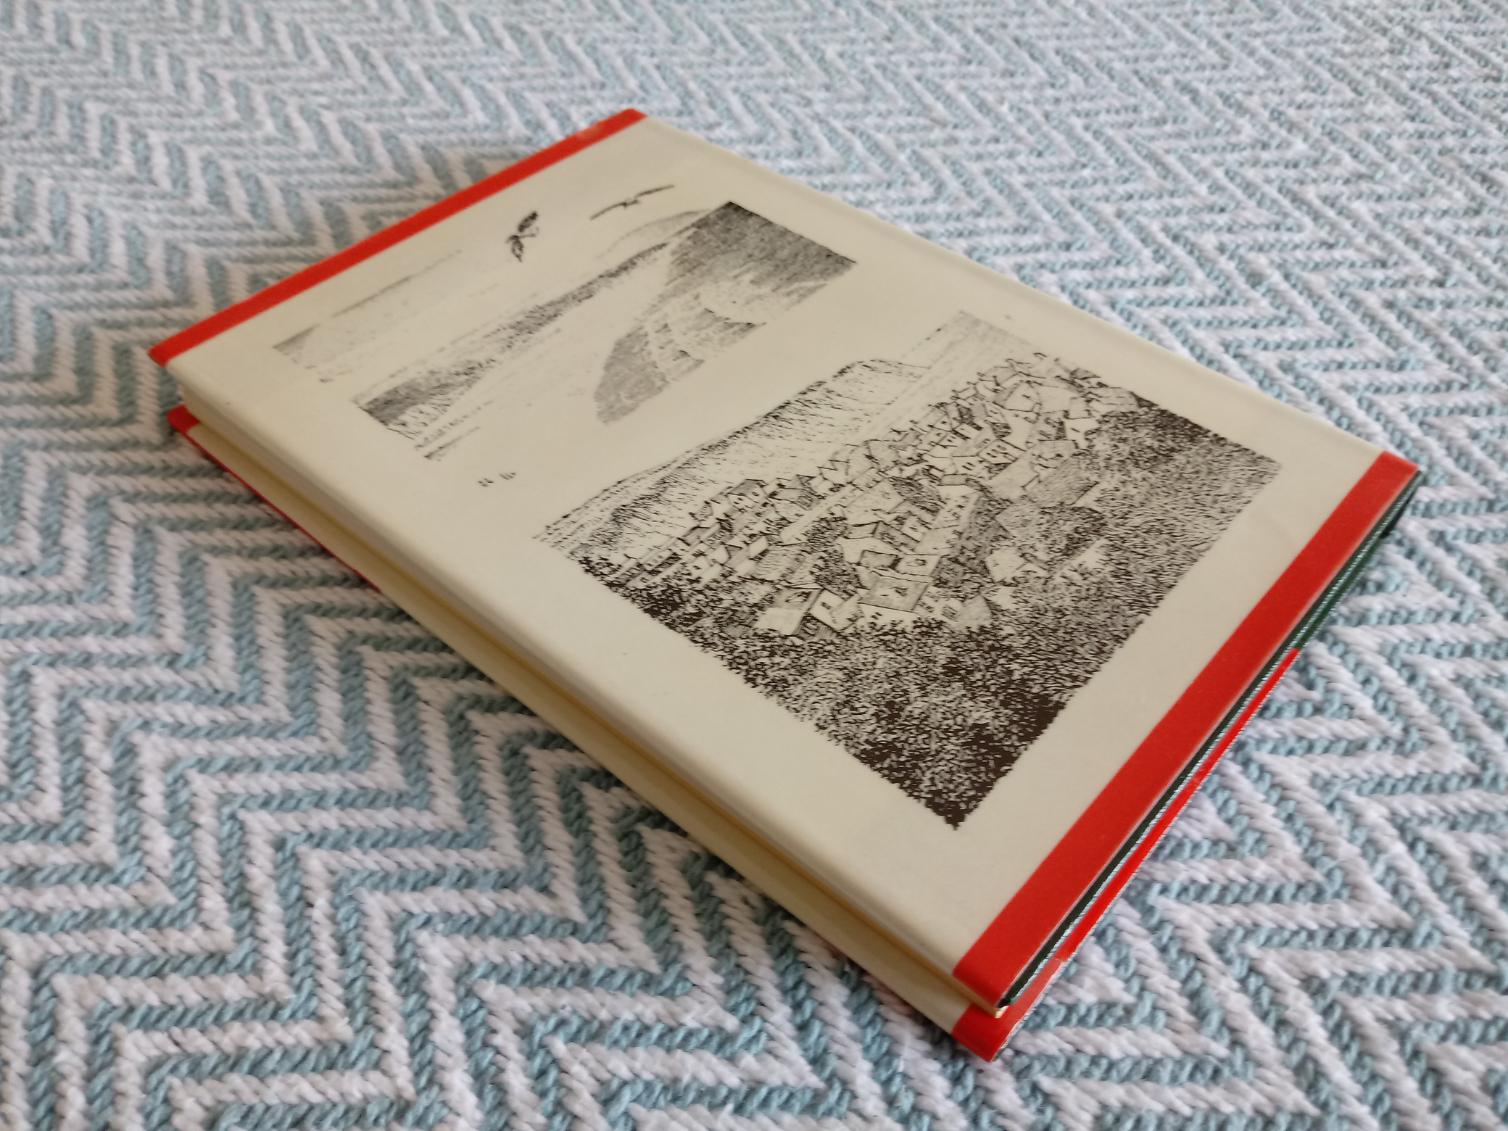 A Coast to Coast Walk by A. Wainwright hardback book 168 pages published 1973 Westmorland Gazette.